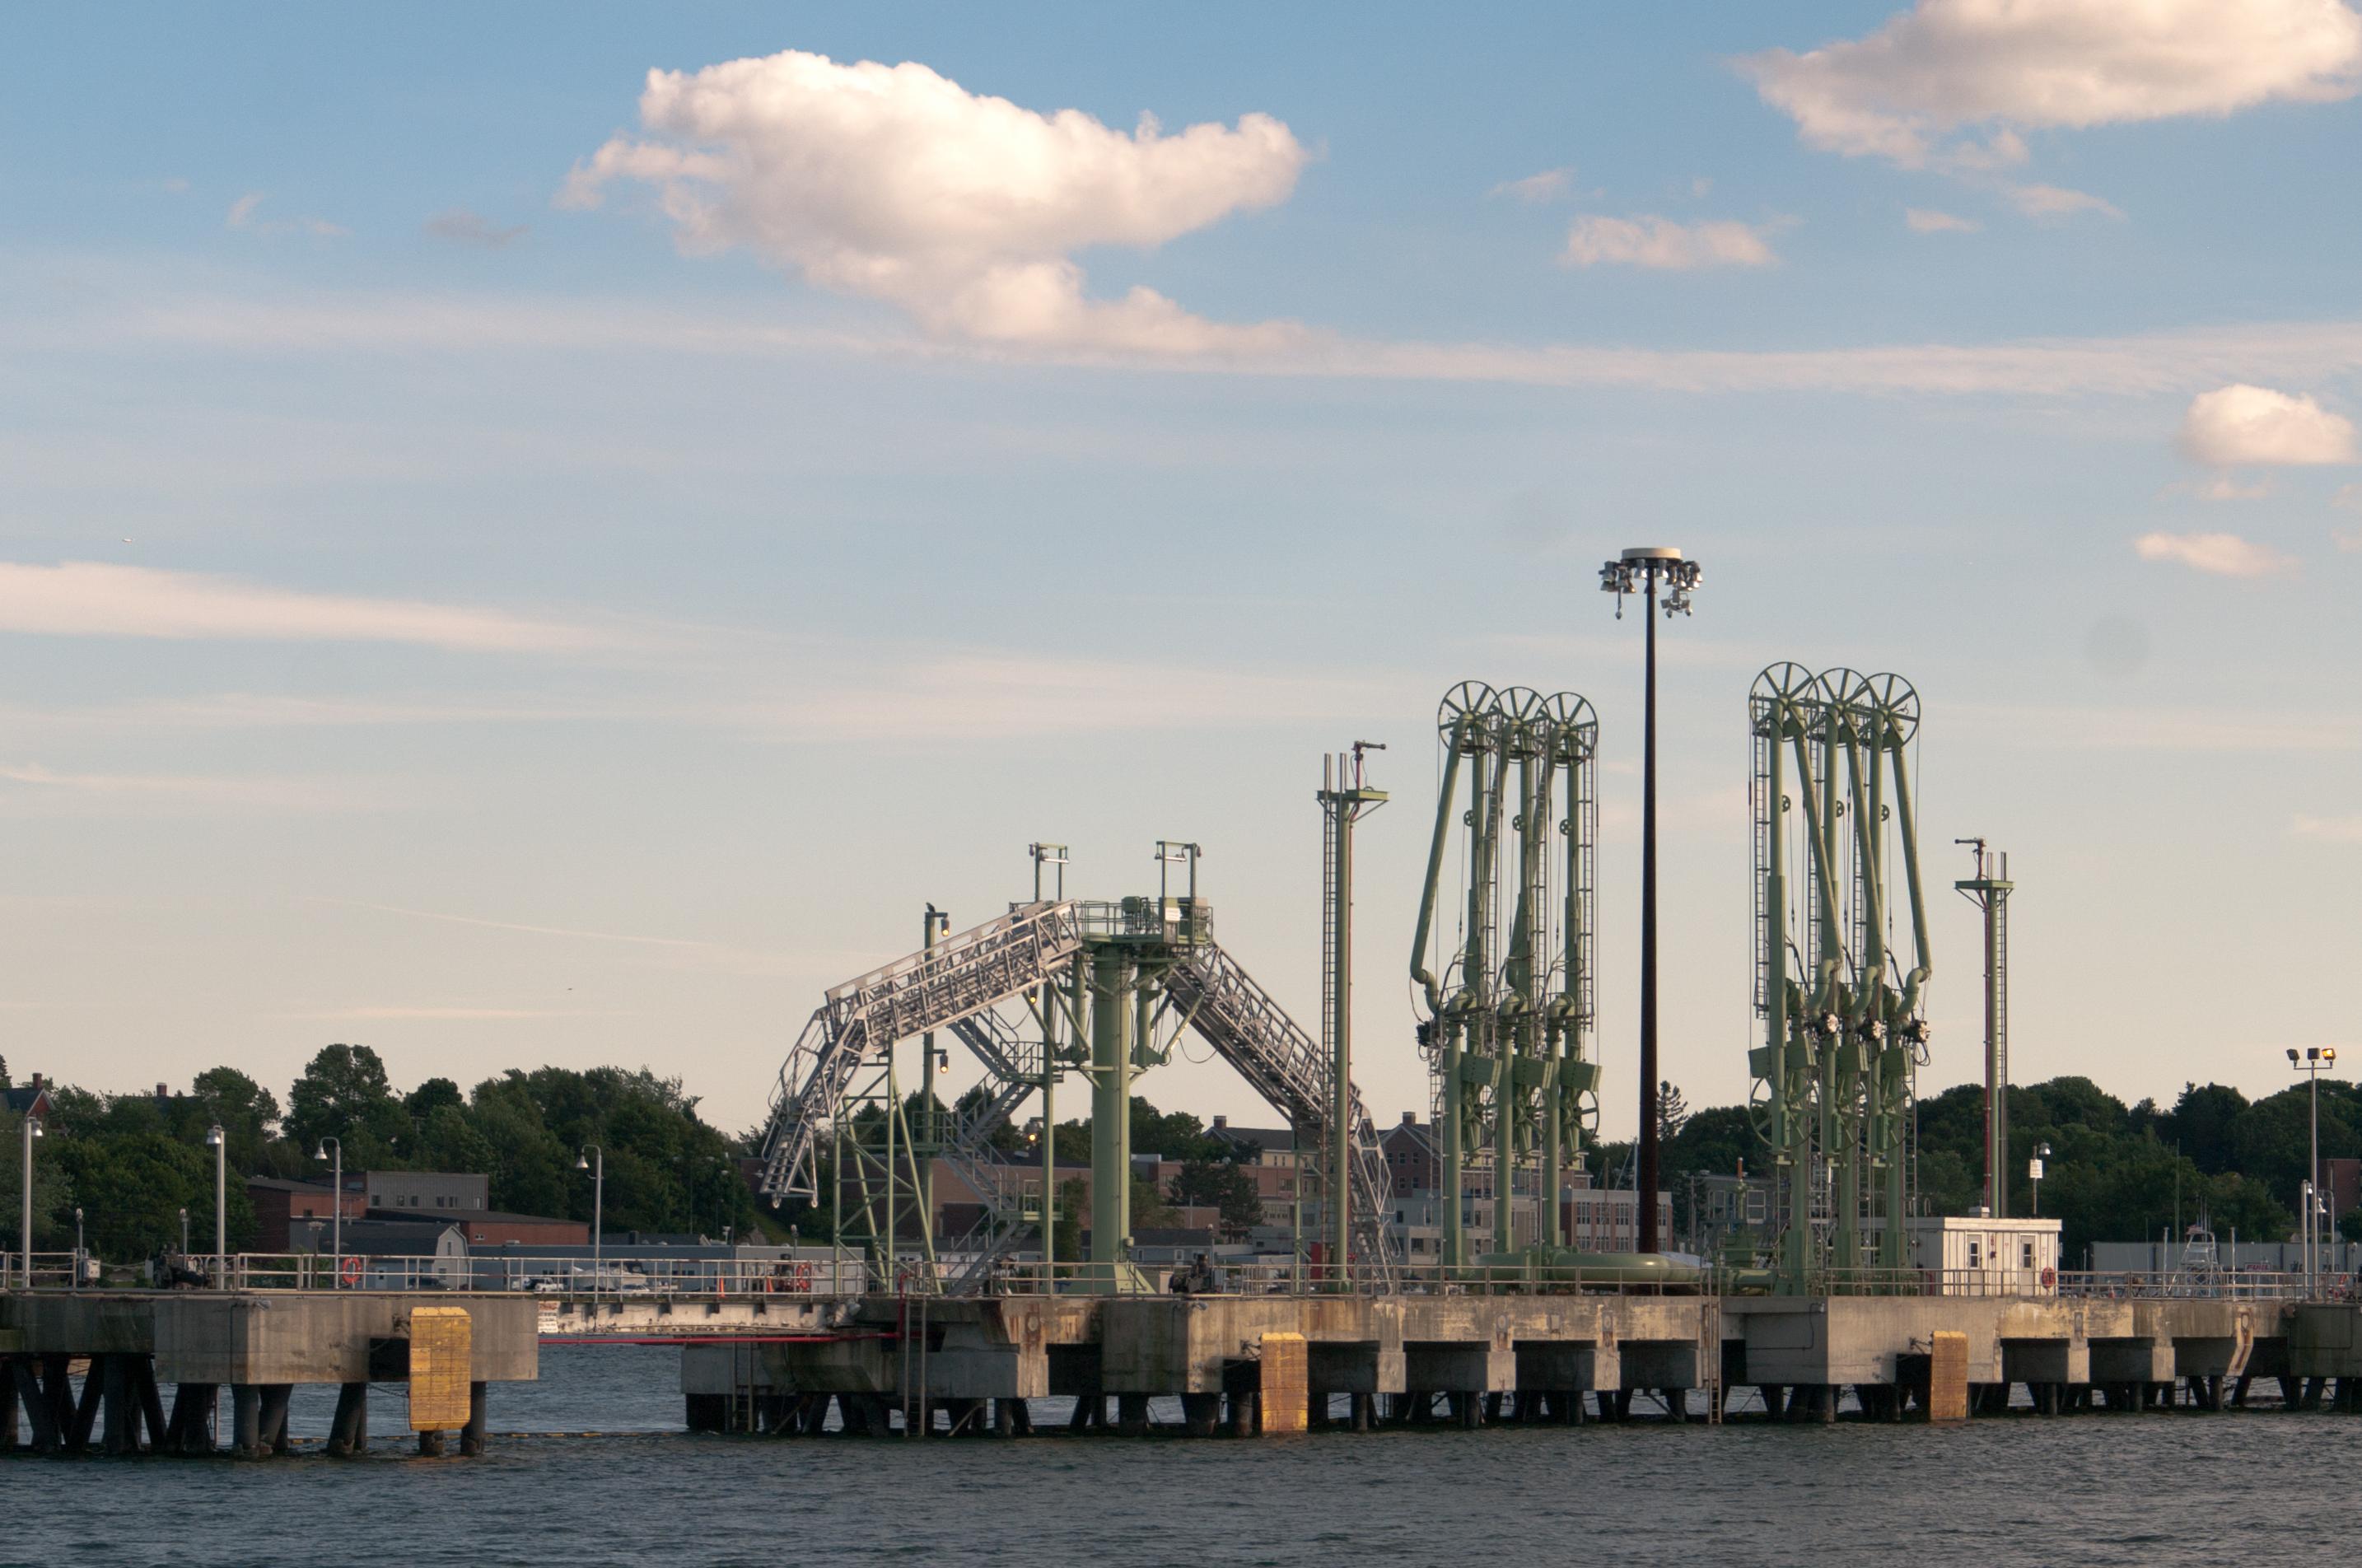 Port of Maine